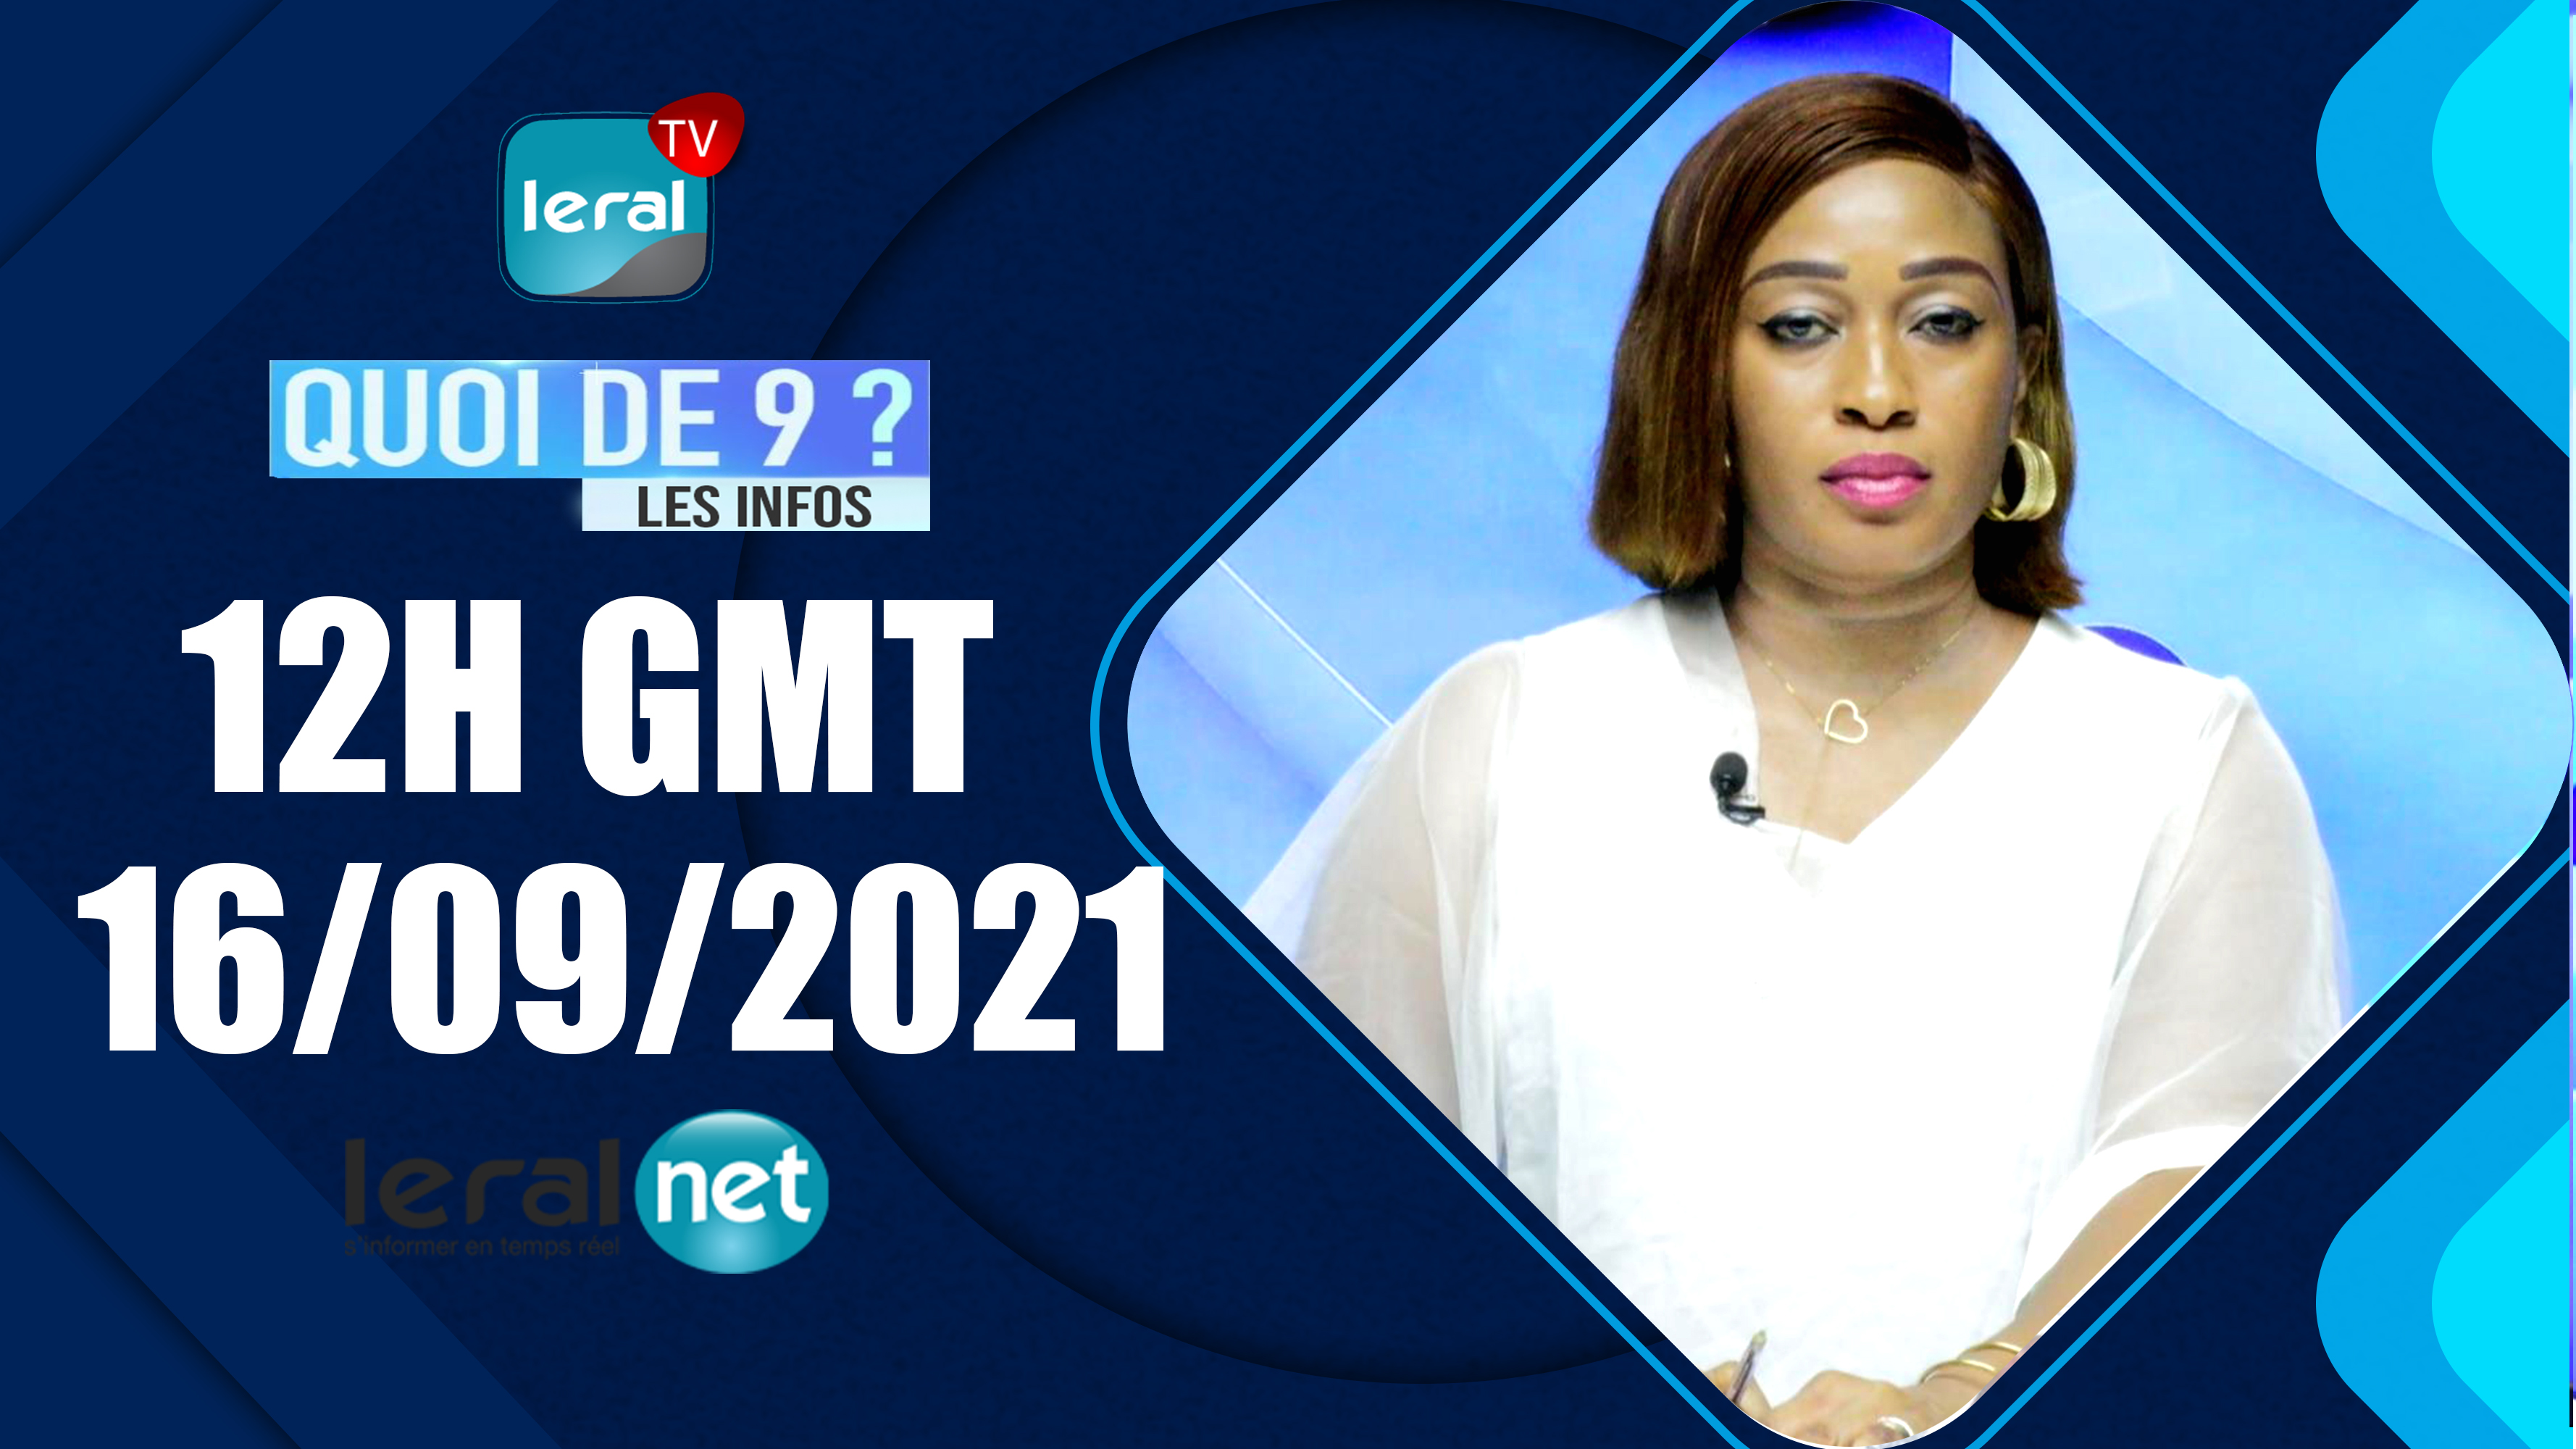 QUOI DE 9 ? LES INFOS 12H GMT - CE 16/09/ 2021 - PR: FATIMA COULIBALY - #LERALTV